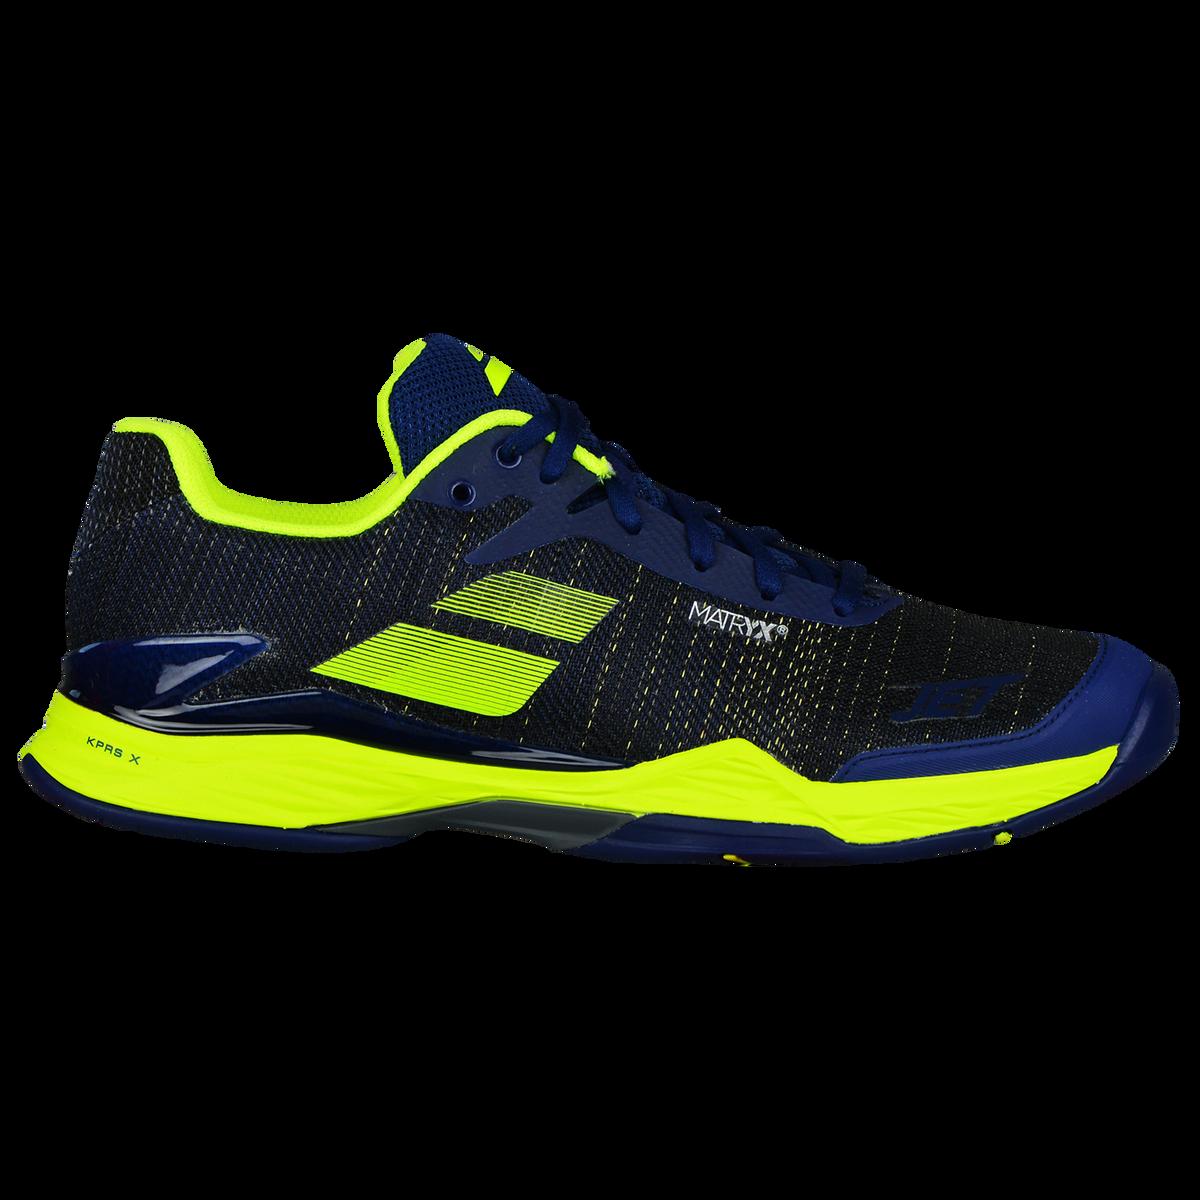 5278b6c282e38 Babolat Jet Mach II All Court Men's Tennis Shoe - Blue/Yellow